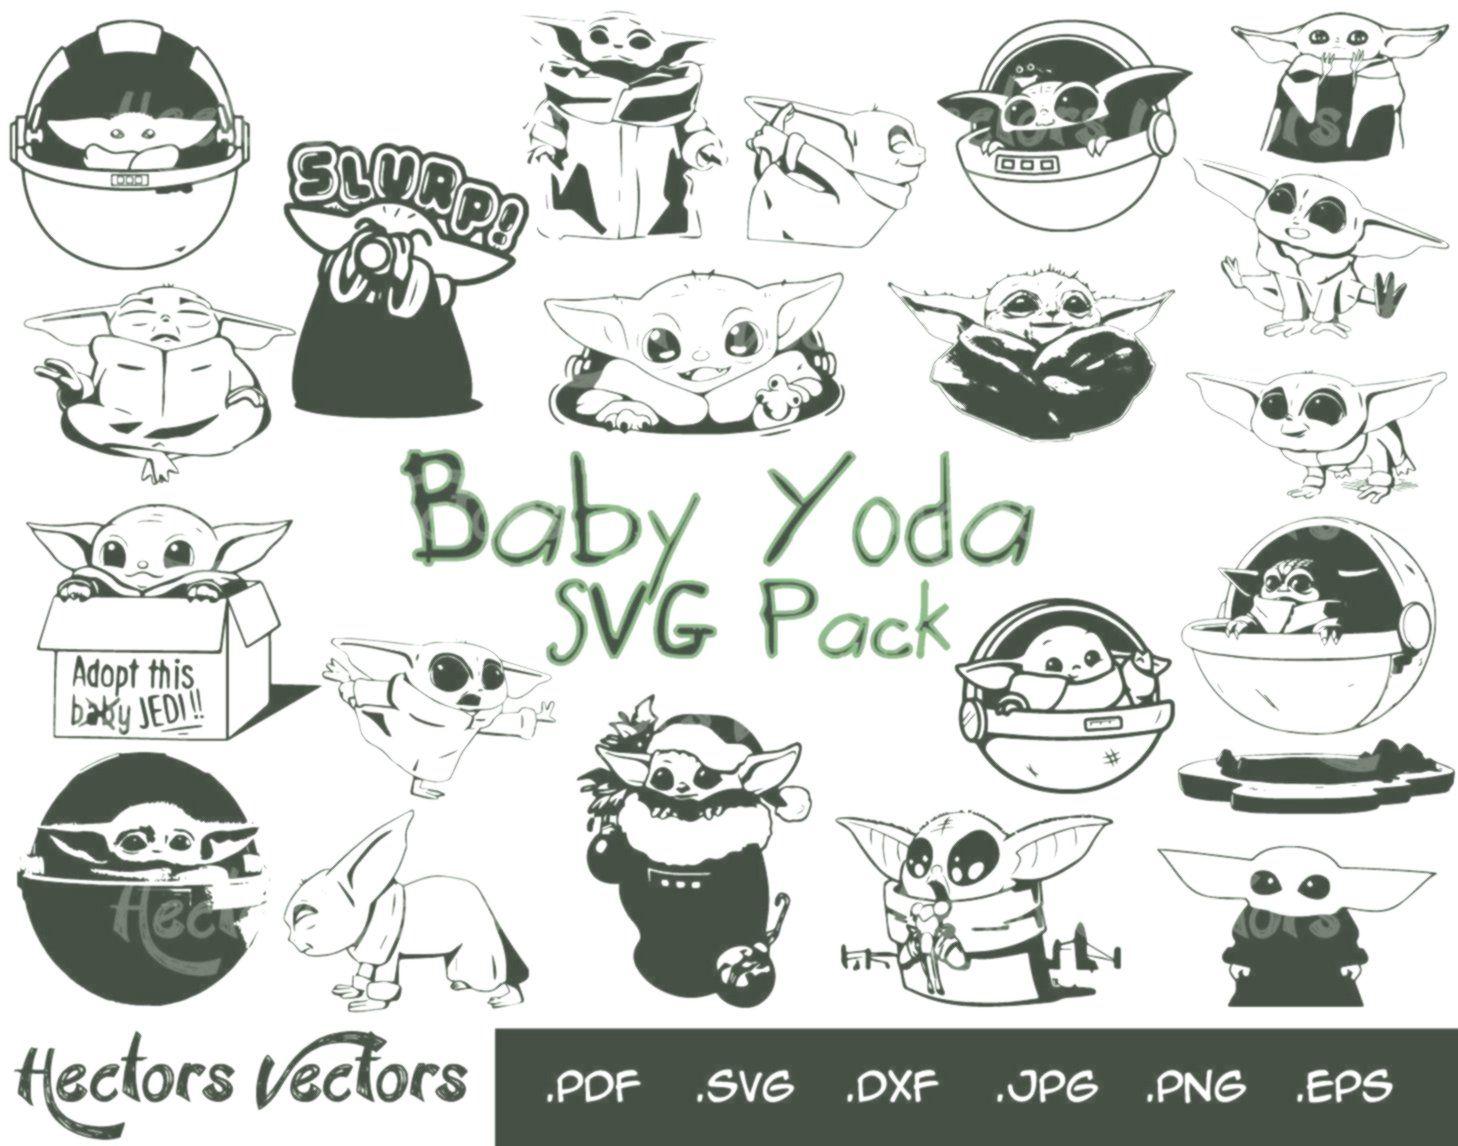 Baby Yoda Svg Baby Yoda Baby Yoda Vector Baby Yoda Silhouette The Child Svg Jedi Svg Star Wars Svg Mini Yoda Svg Sma Star Wars Drawings Yoda Disney Silhouettes